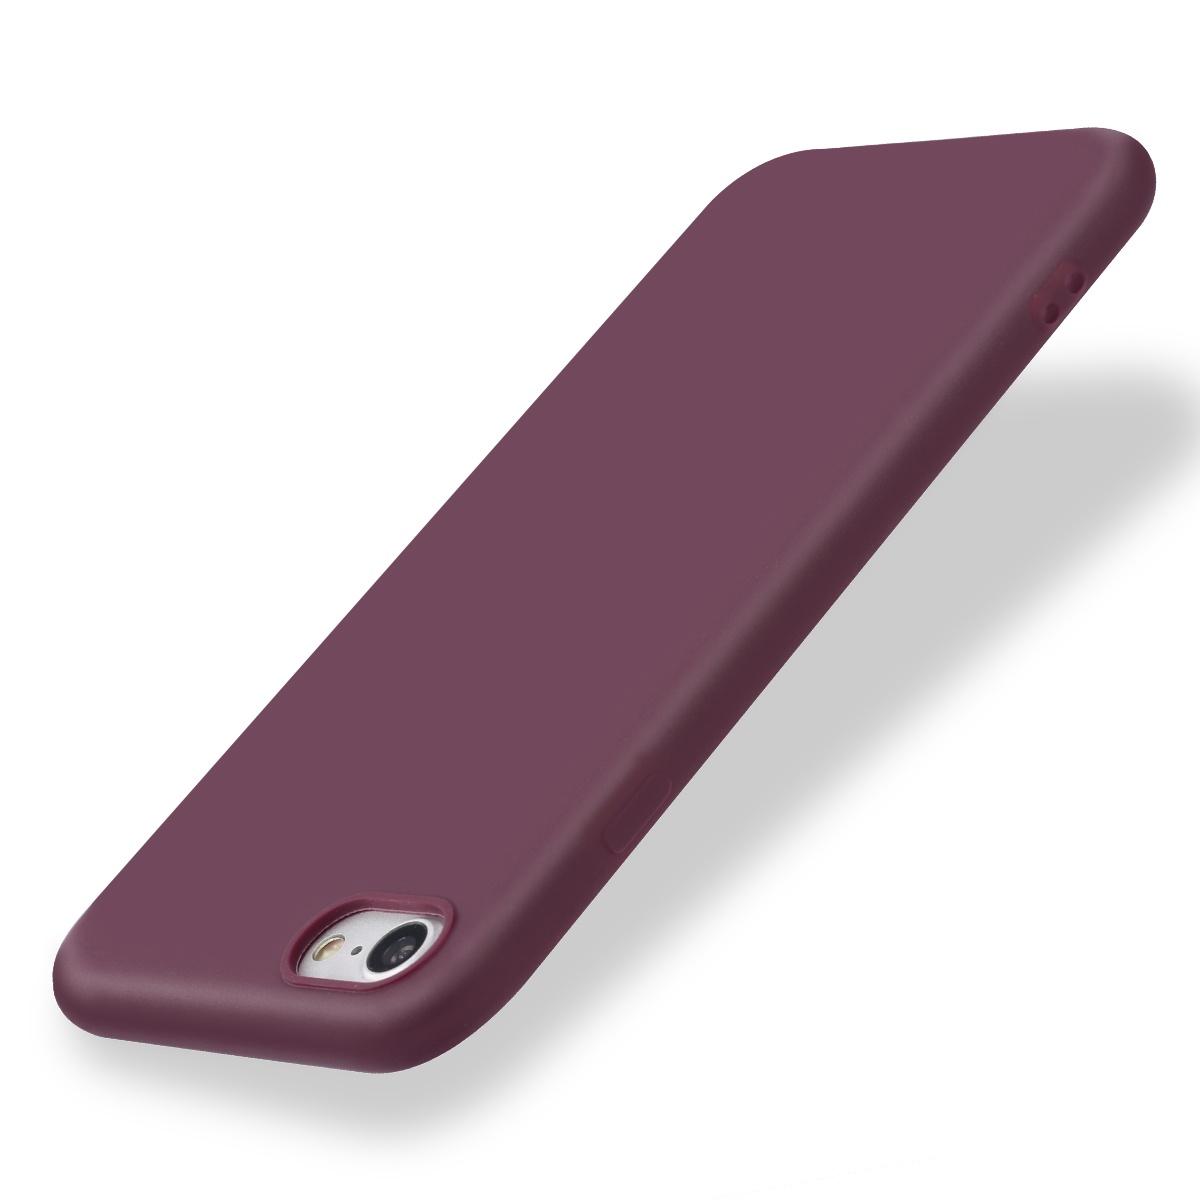 Чехол для сотового телефона Чехол для задней крышки смартфона для iPhone 5 / SE / 6 / 6s / 7 / 8 / 6 Plus / 6s Plus / 7 Plus / 8 Plus / X, бордовый аксессуар чехол аккумулятор df ibattery 21 для apple iphone 6 plus 6s plus 7 plus 8 plus 7200mah black